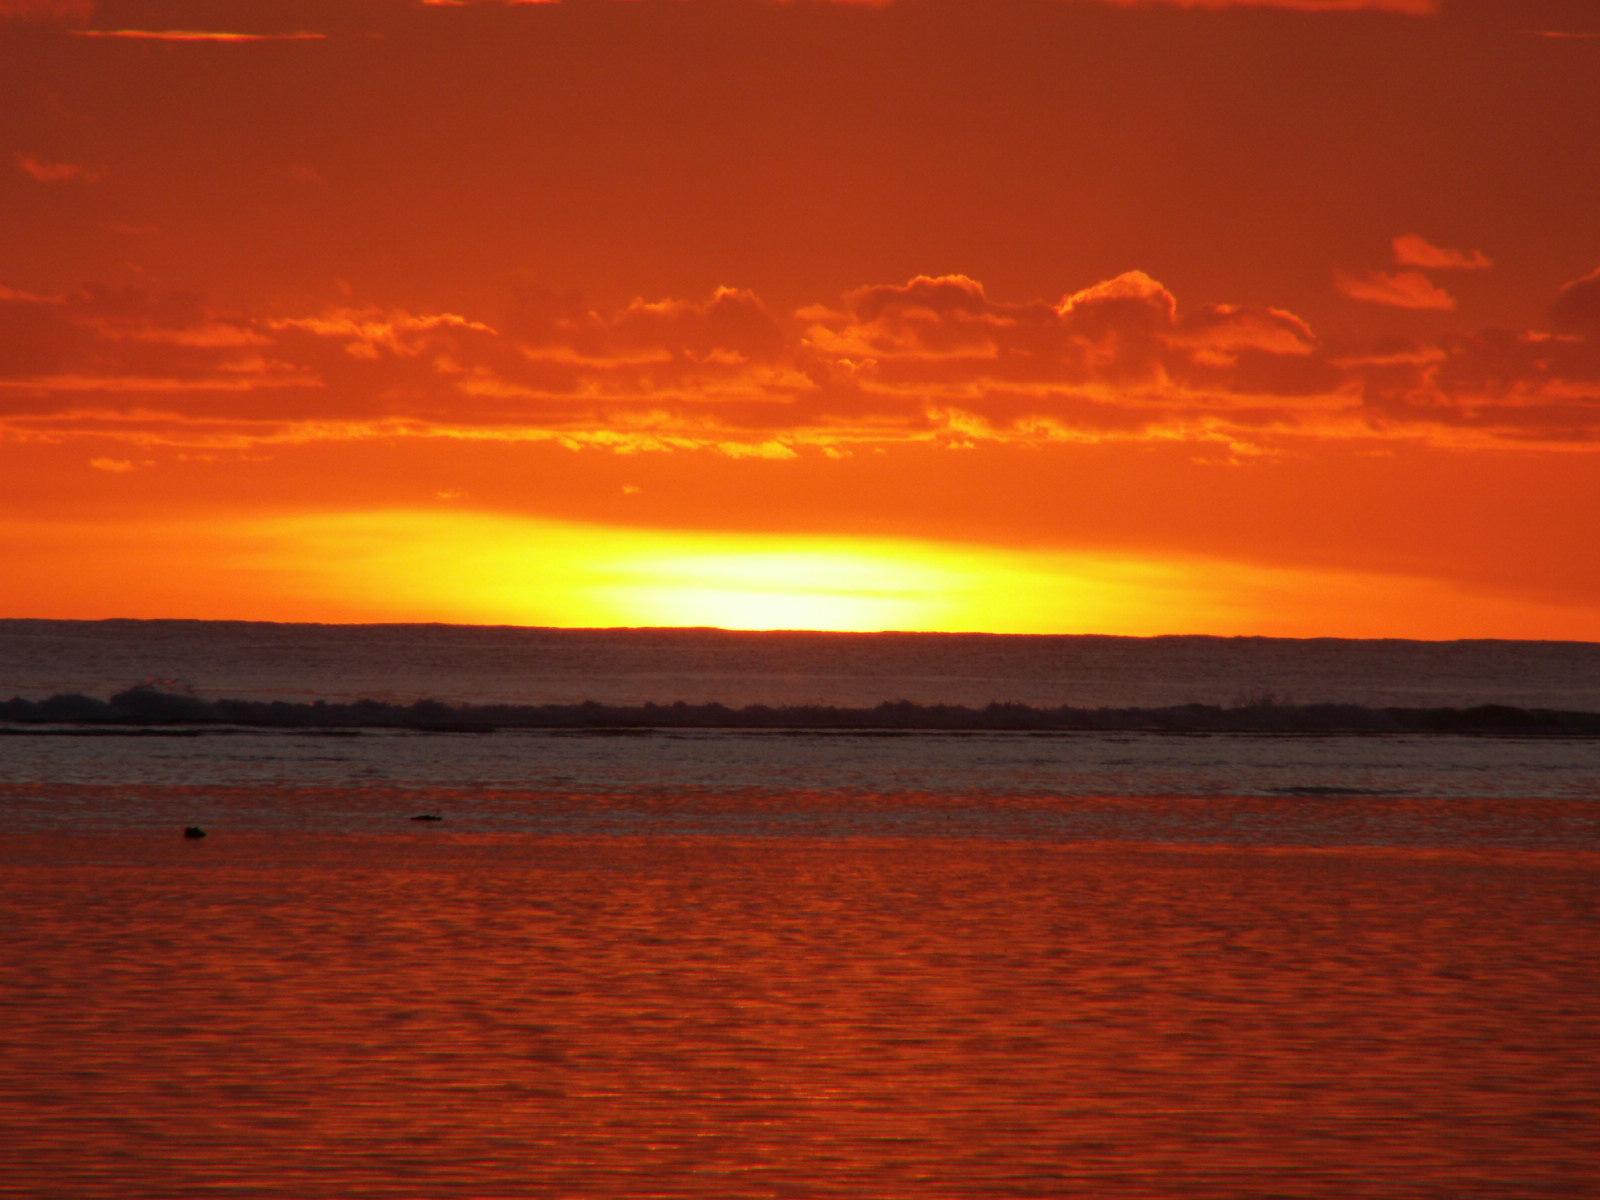 Accommodation Rarotonga | Rental Accommodation in Rarotonga